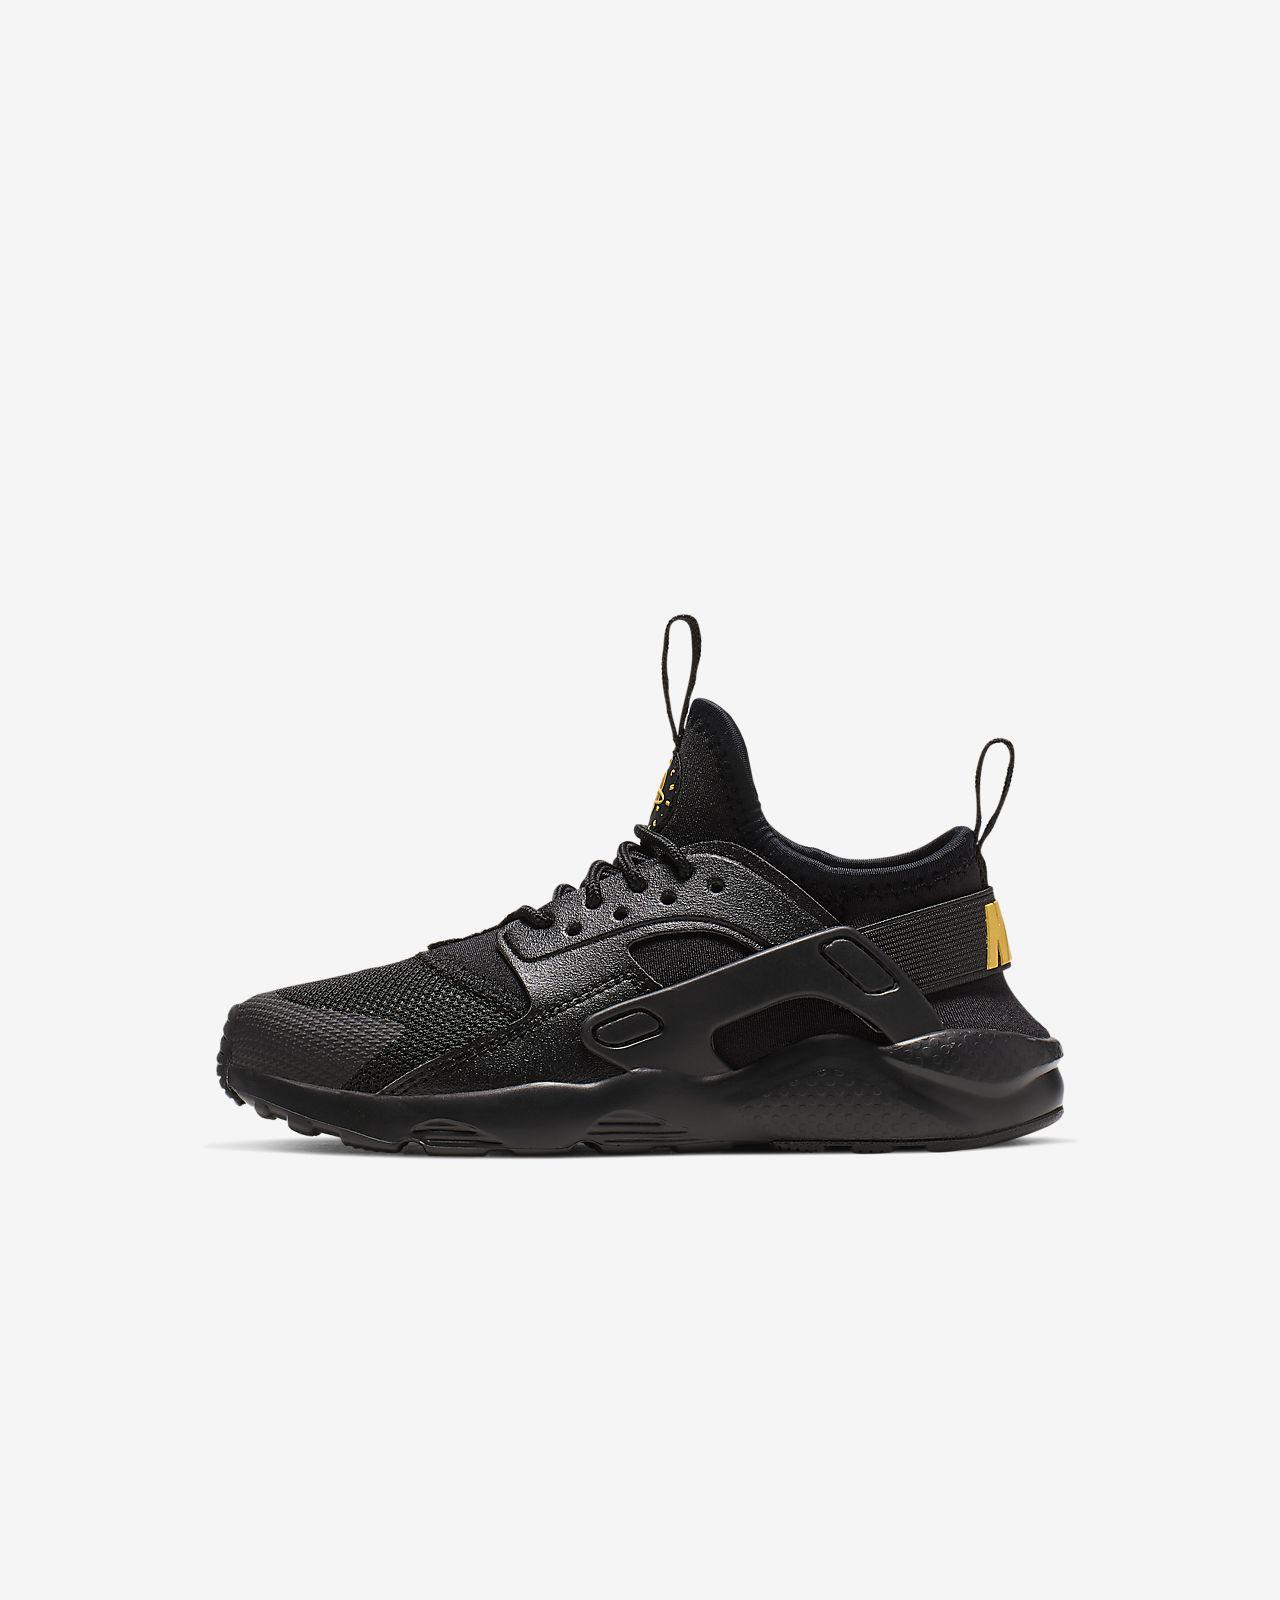 400f0d3ee Calzado para niños talla pequeña Nike Huarache Run Ultra. Nike.com MX